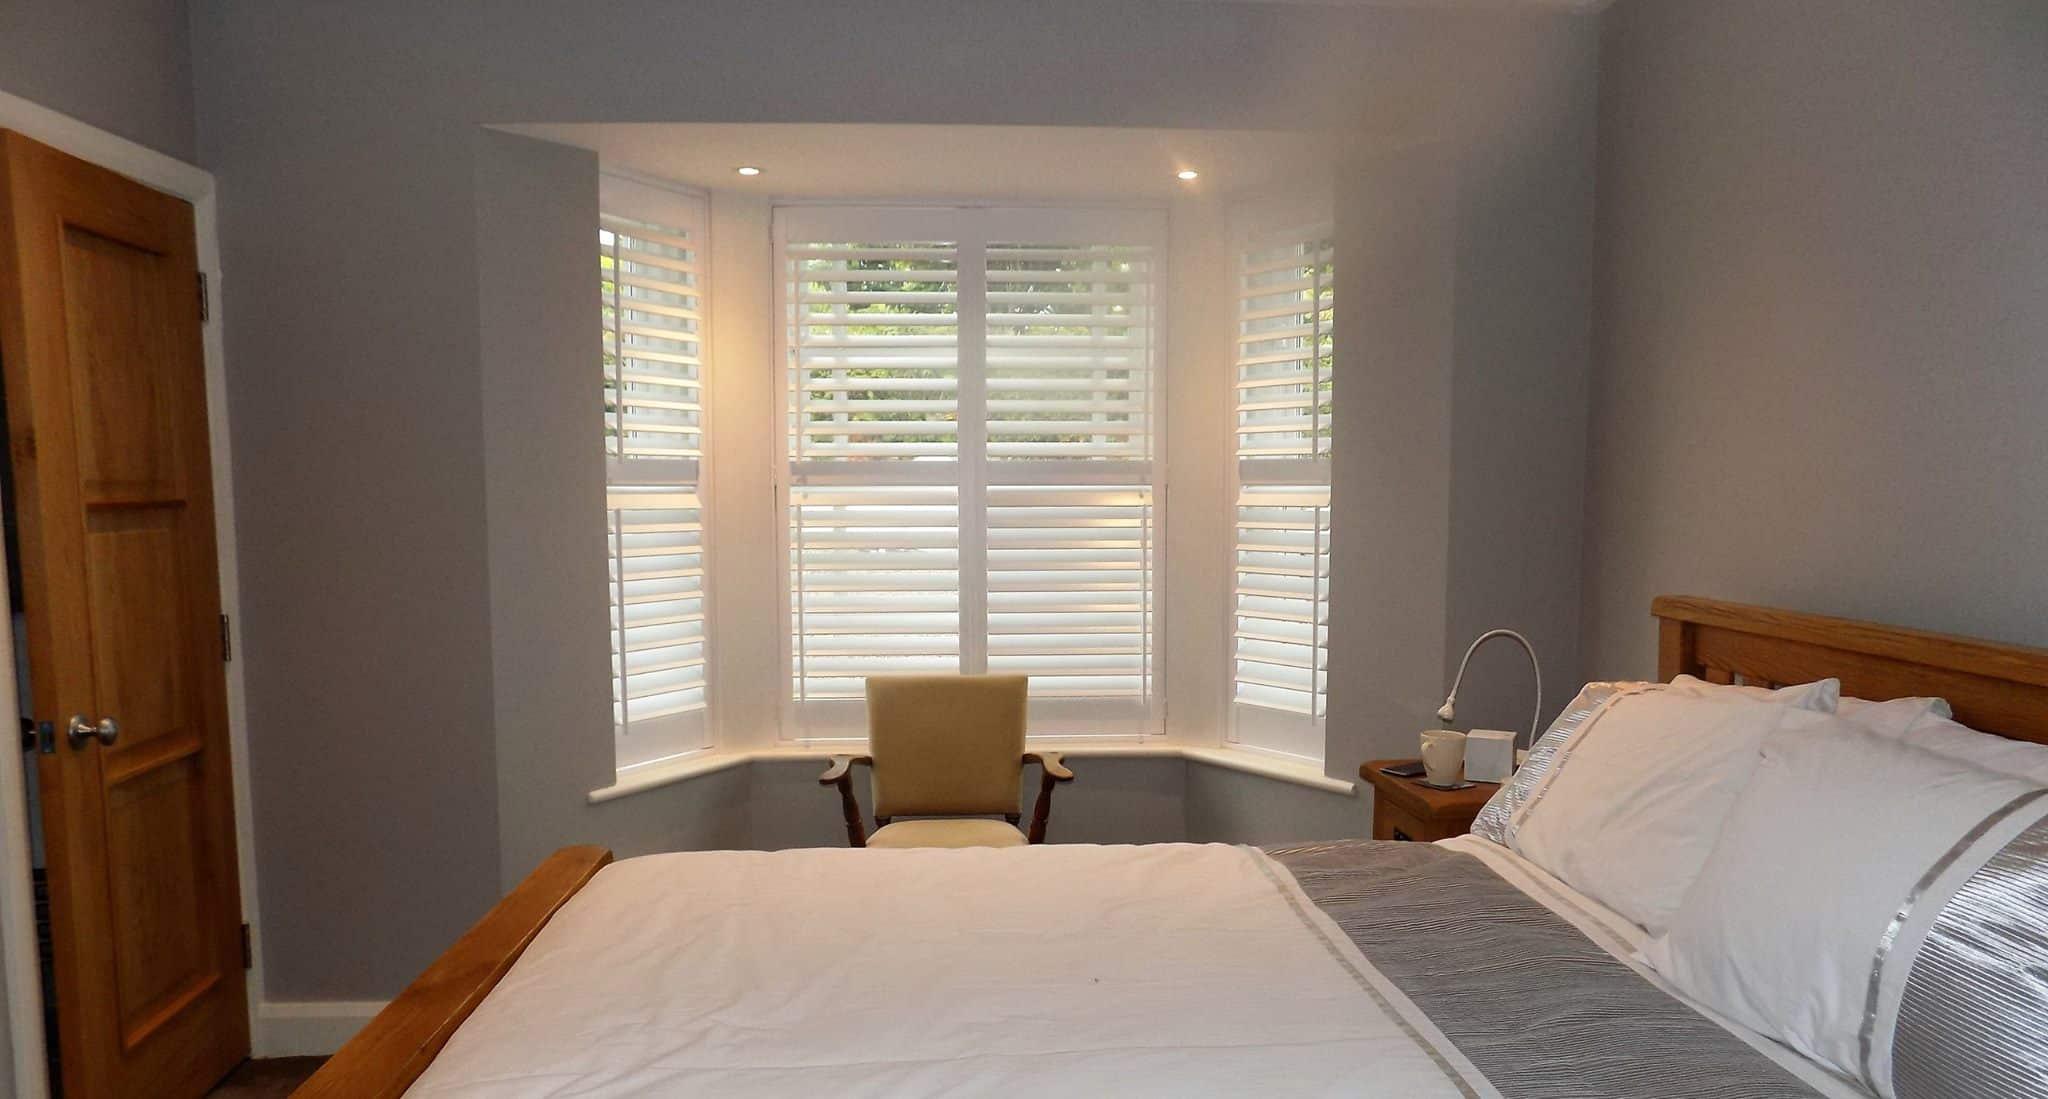 Bedroom Grey Bay Window-Shutters